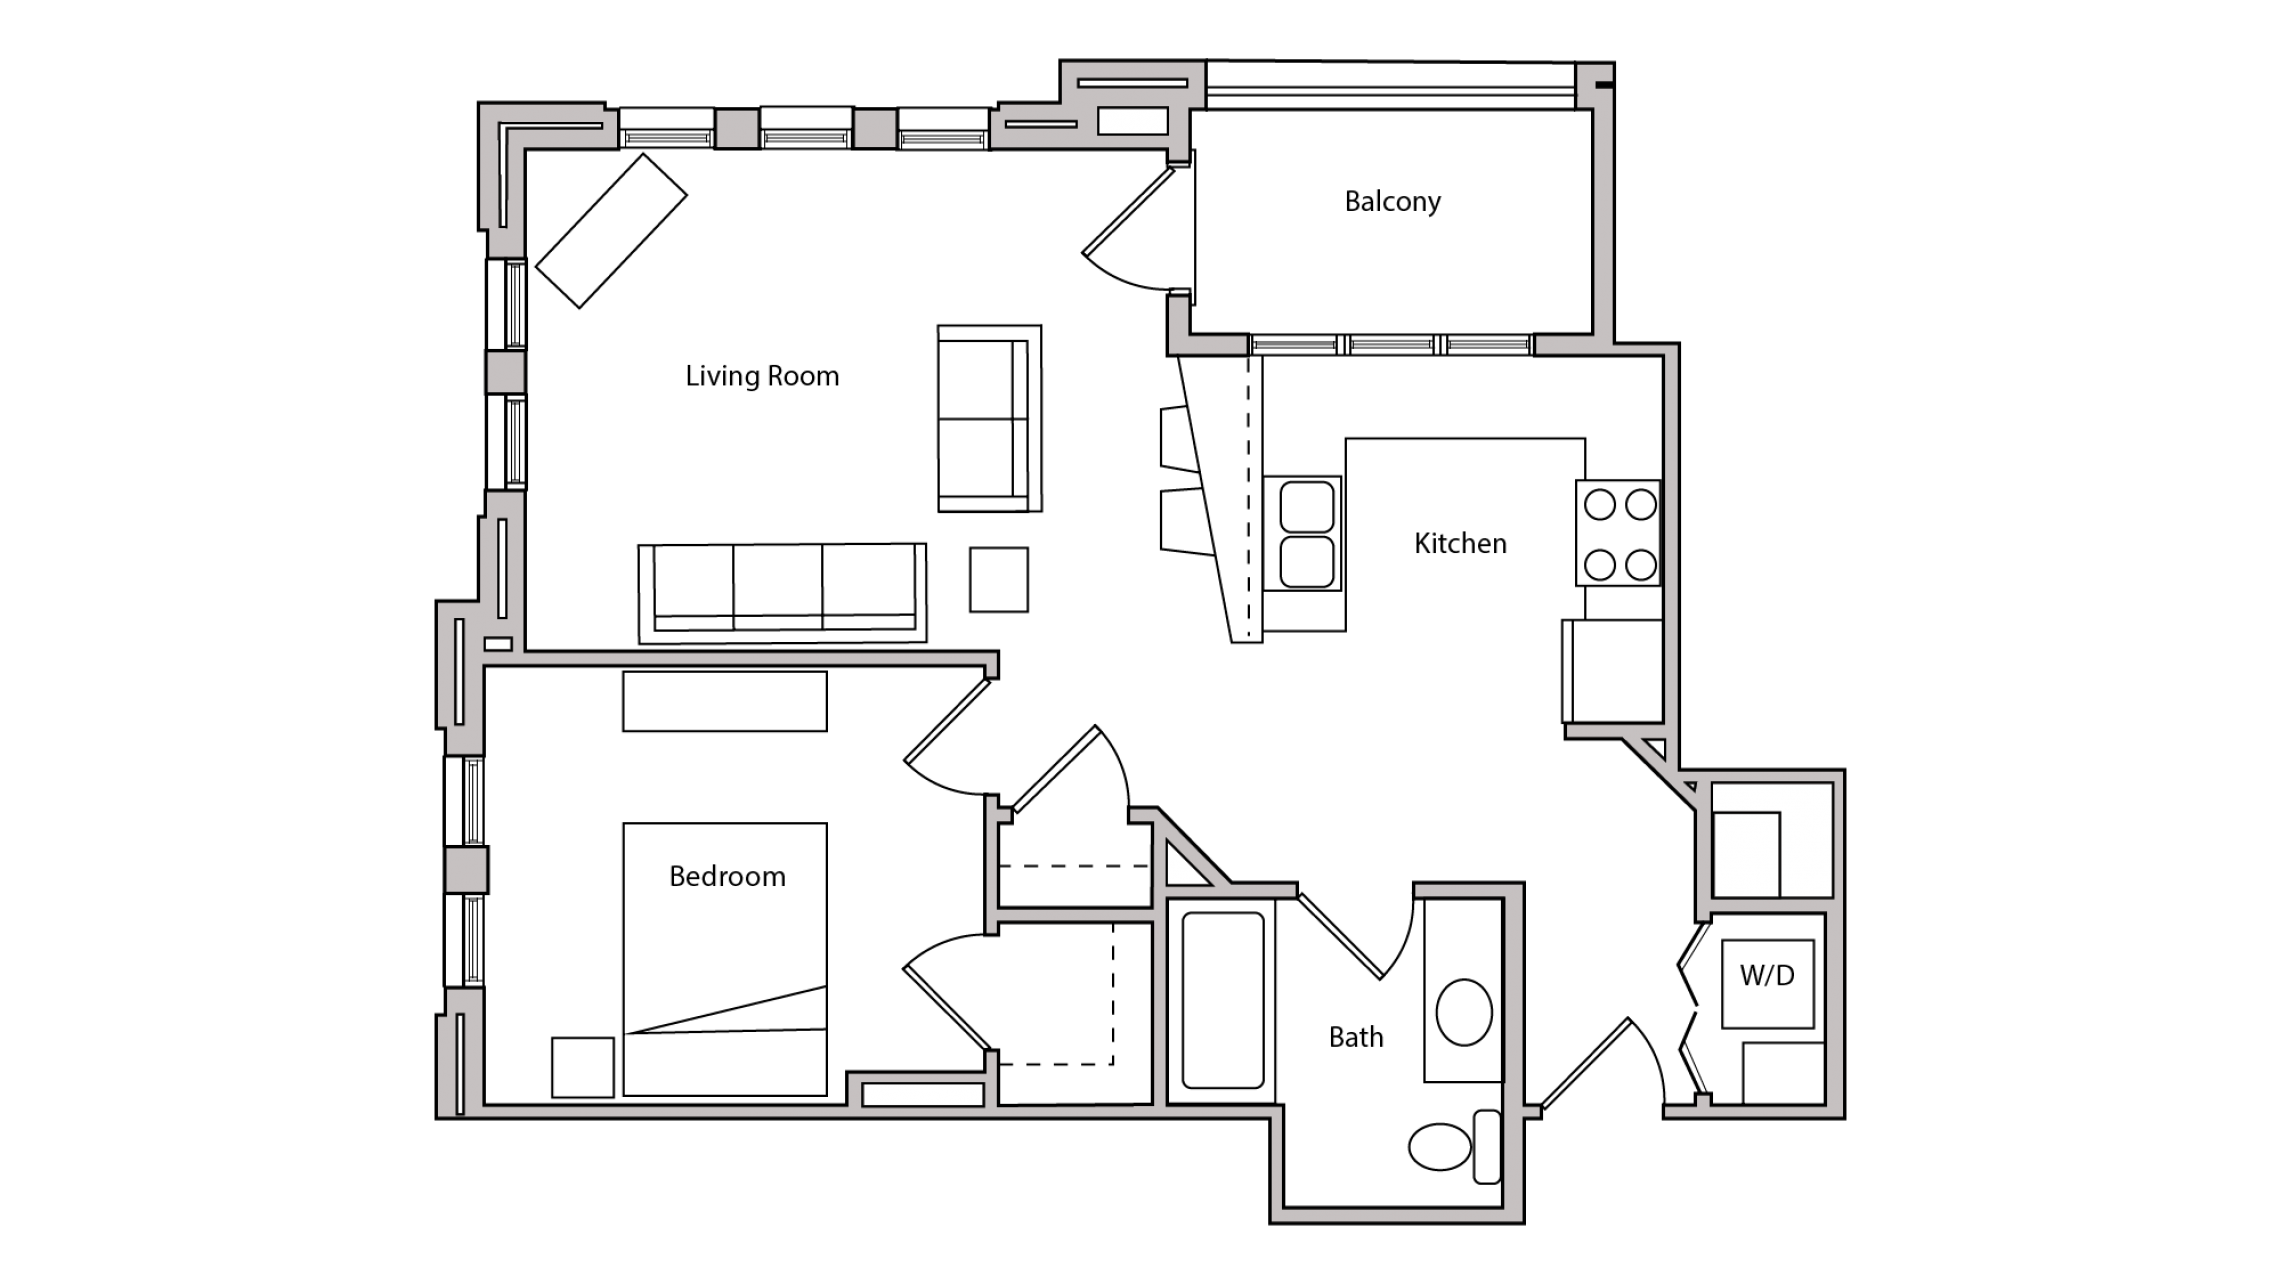 ULI The Depot 1-307 - One Bedroom, One Bathroom